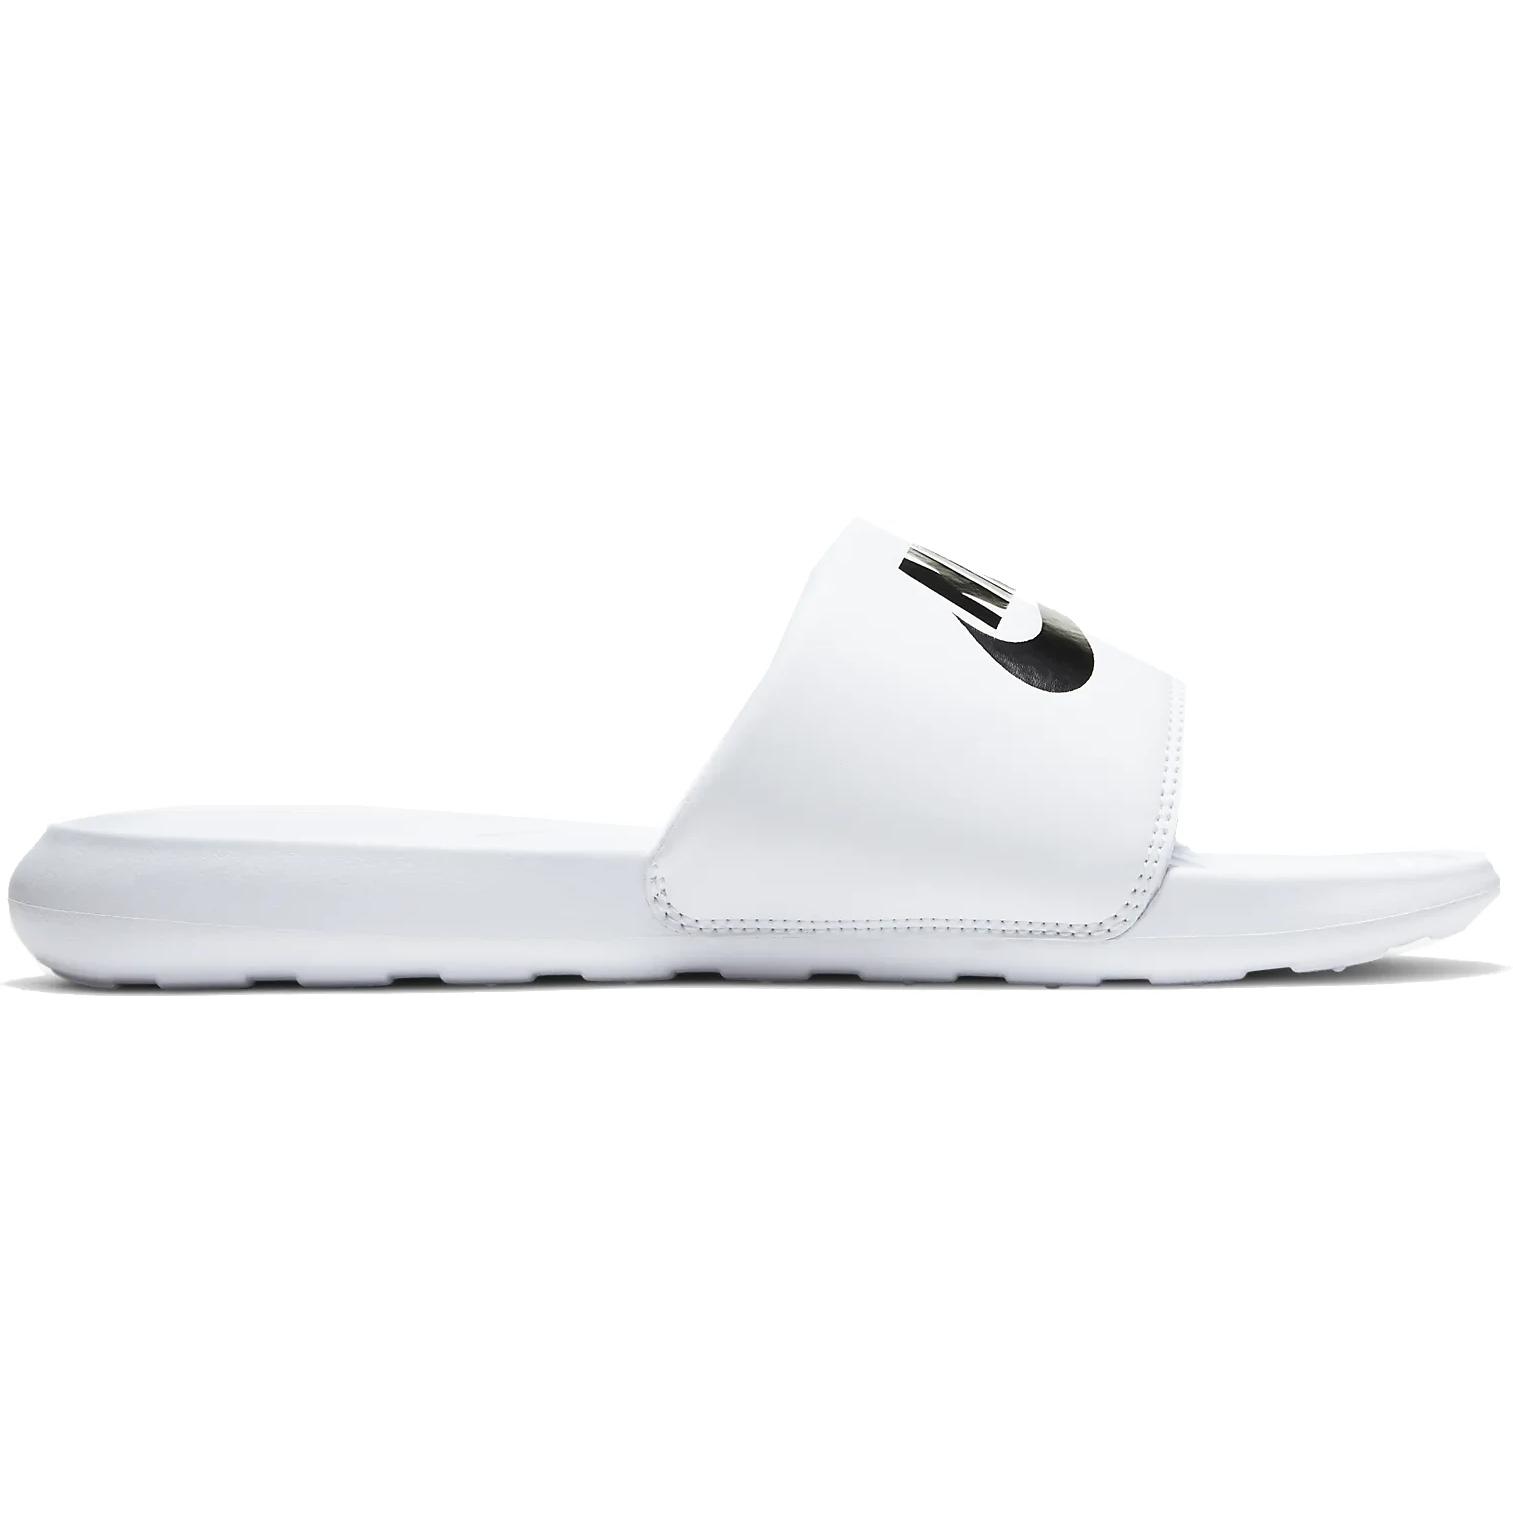 Produktbild von Nike Victori One Slide Herren Badeschuhe - white/black-white CN9675-100